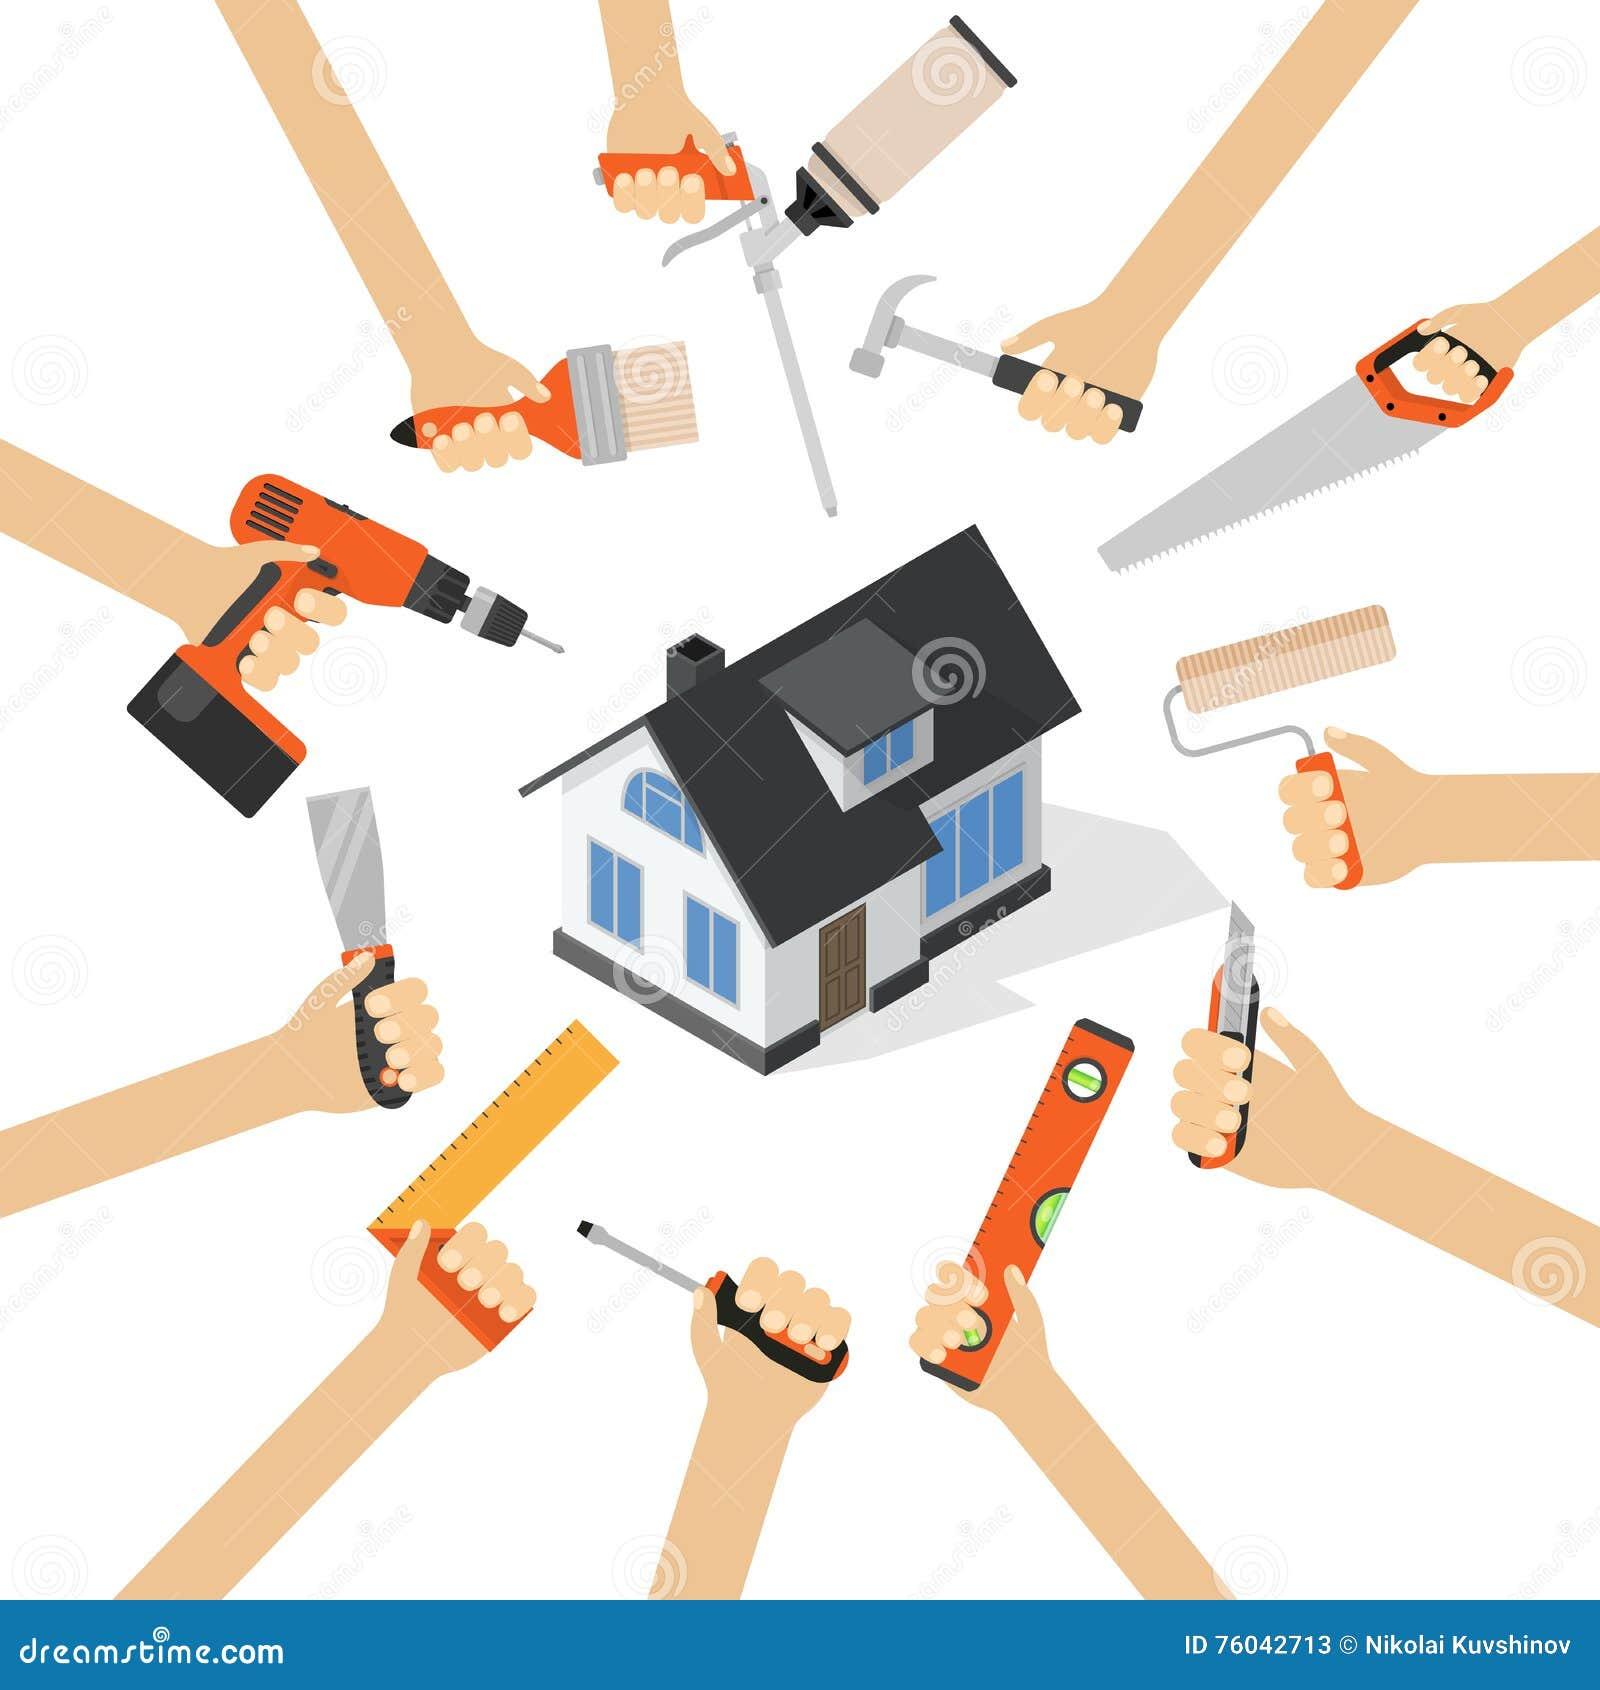 Hands With Home Repair Diy Renovation Housework Tools